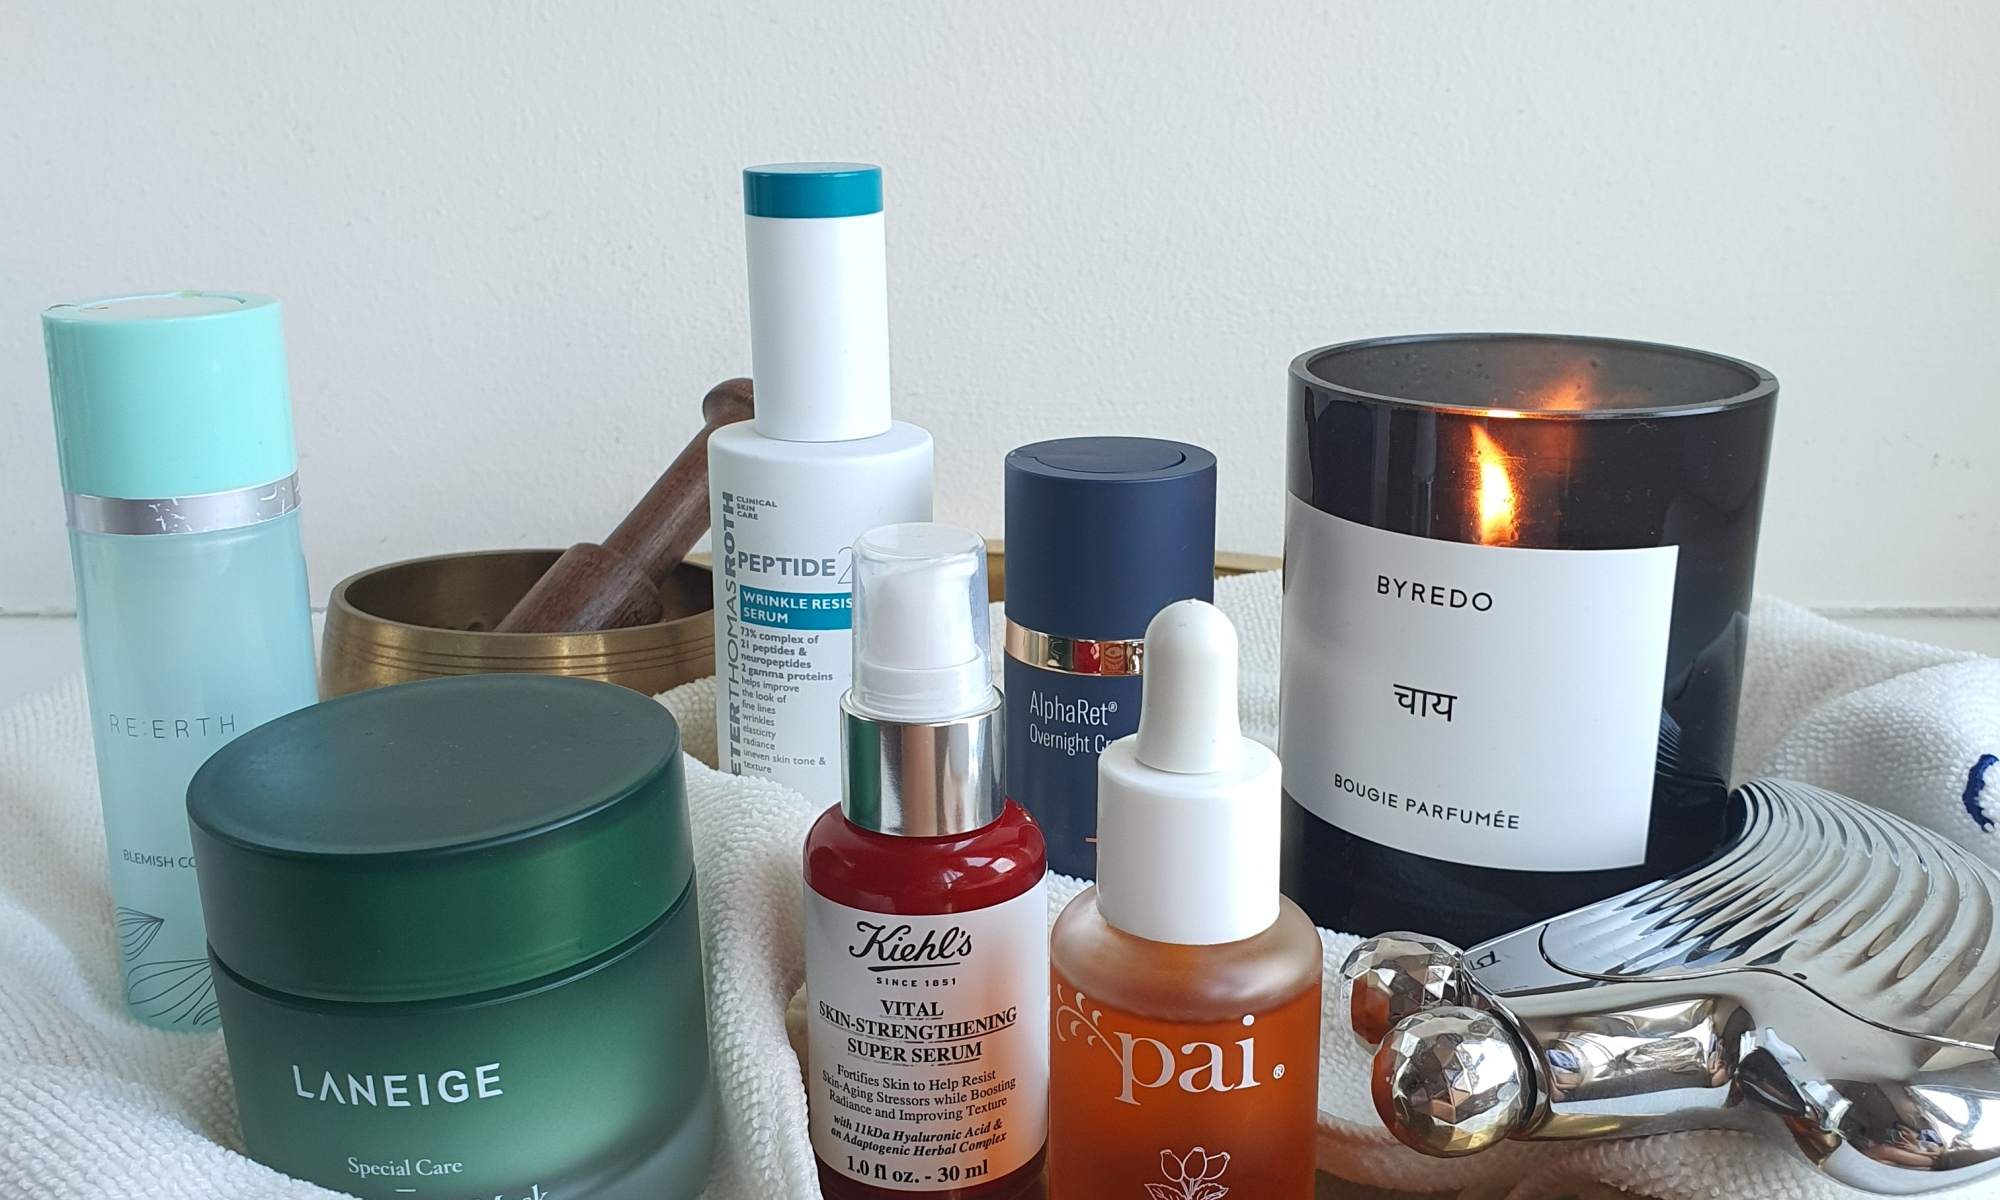 acne skincare, antiageing skincare, maskne skincare